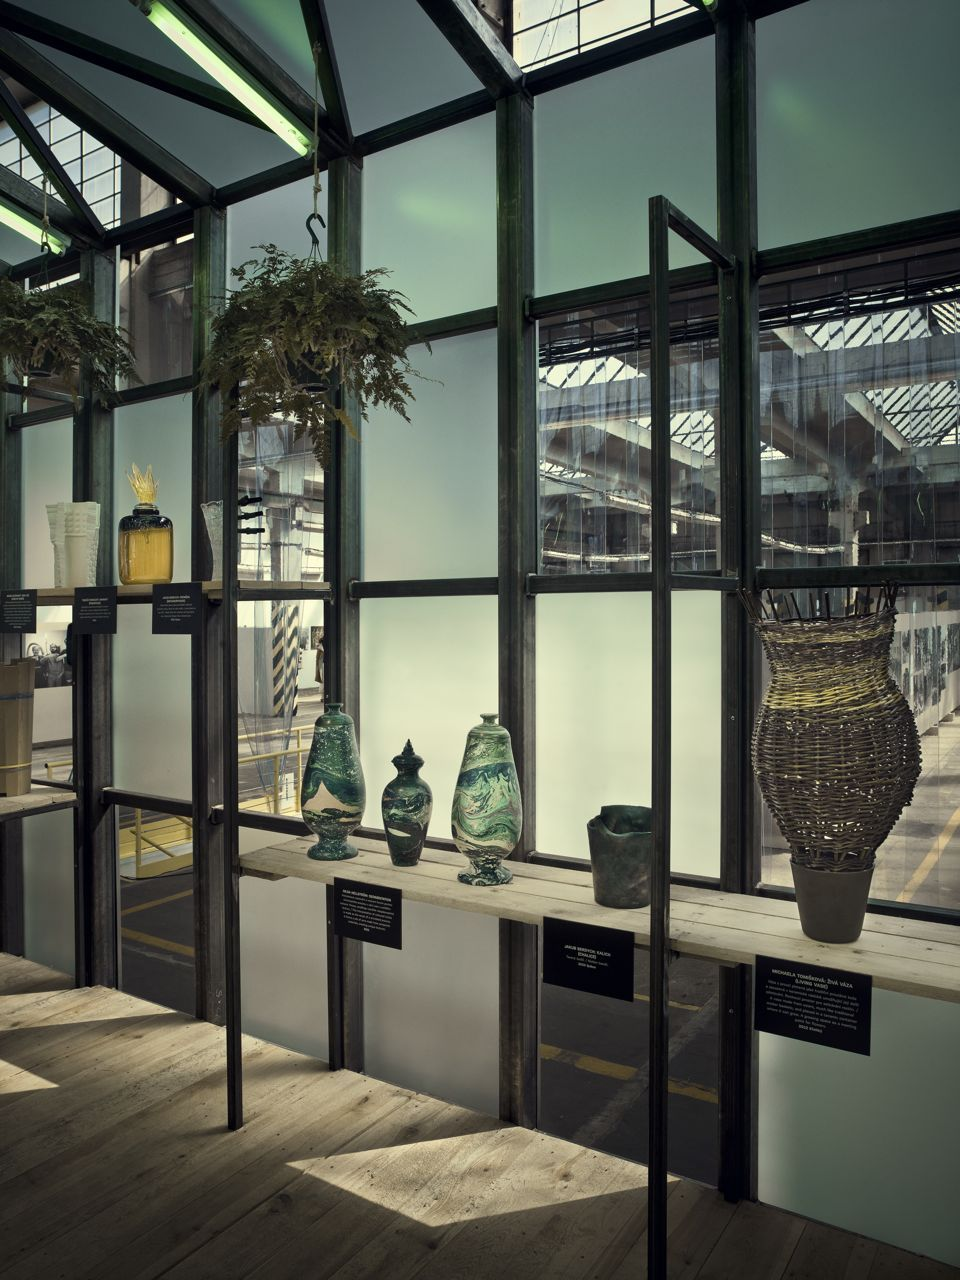 Archiv váz, ©Salim Issa